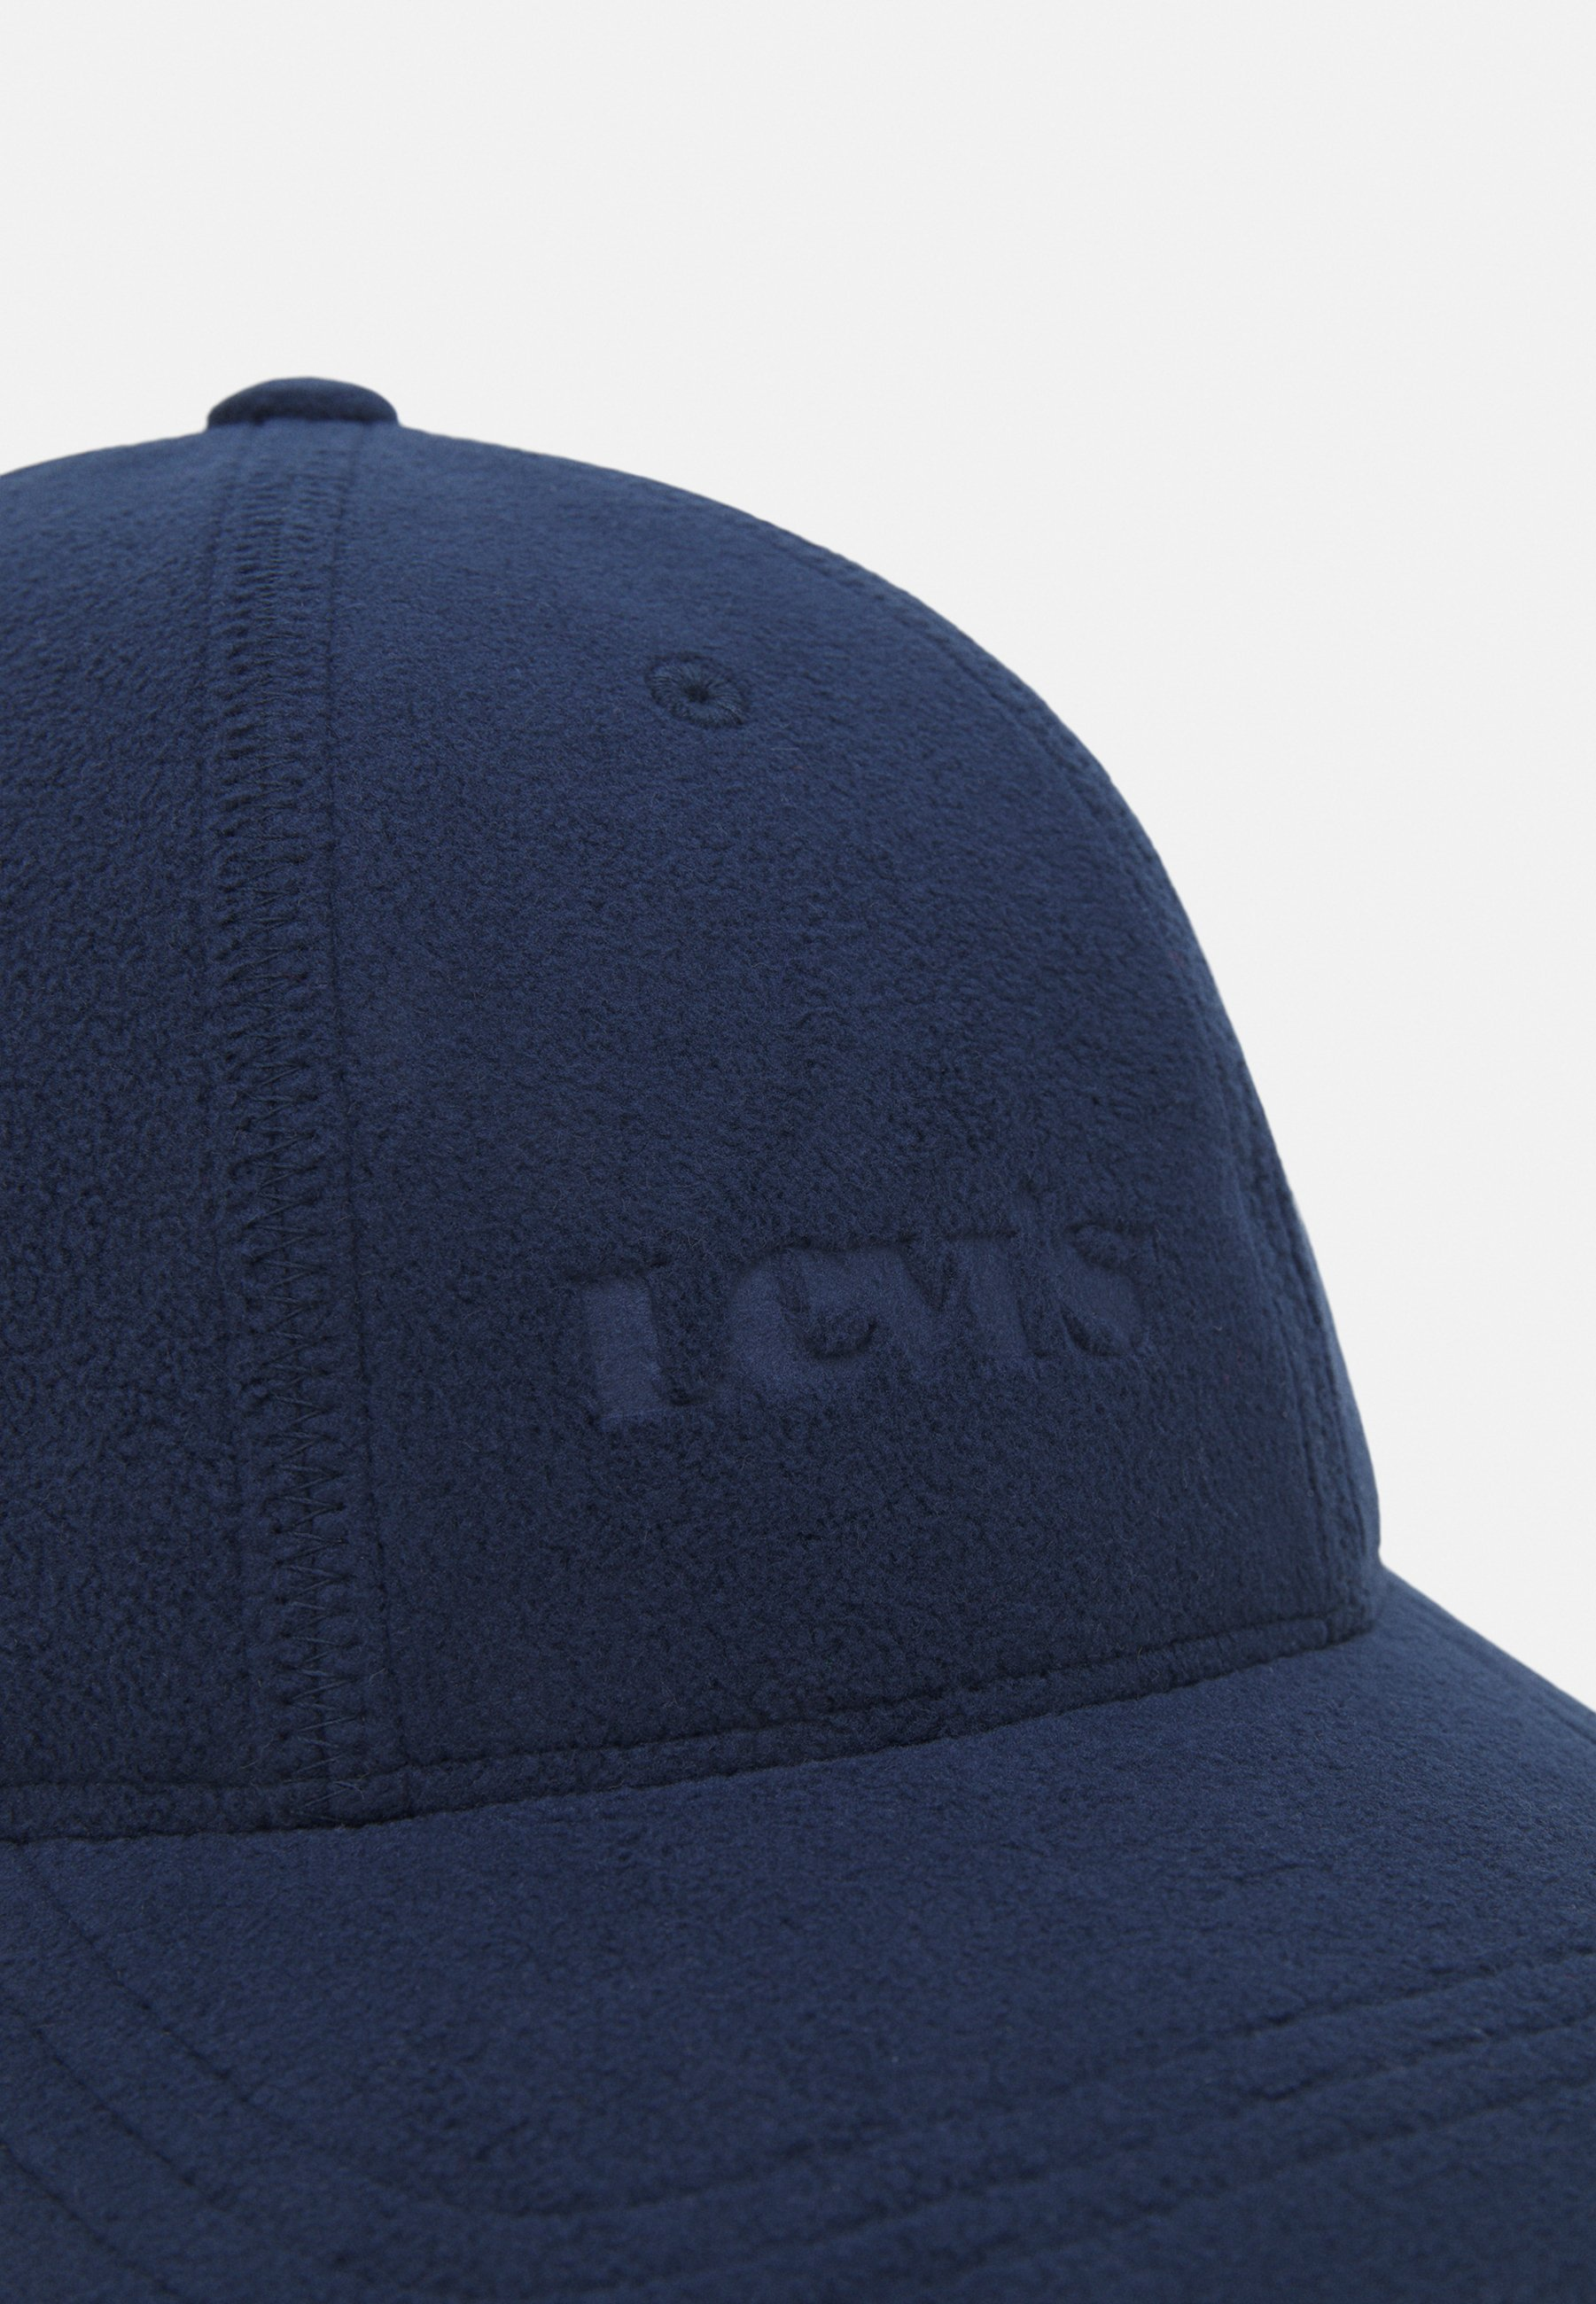 Uomo MODERN VINTAGE FLEXFIT UNISEX - Cappellino